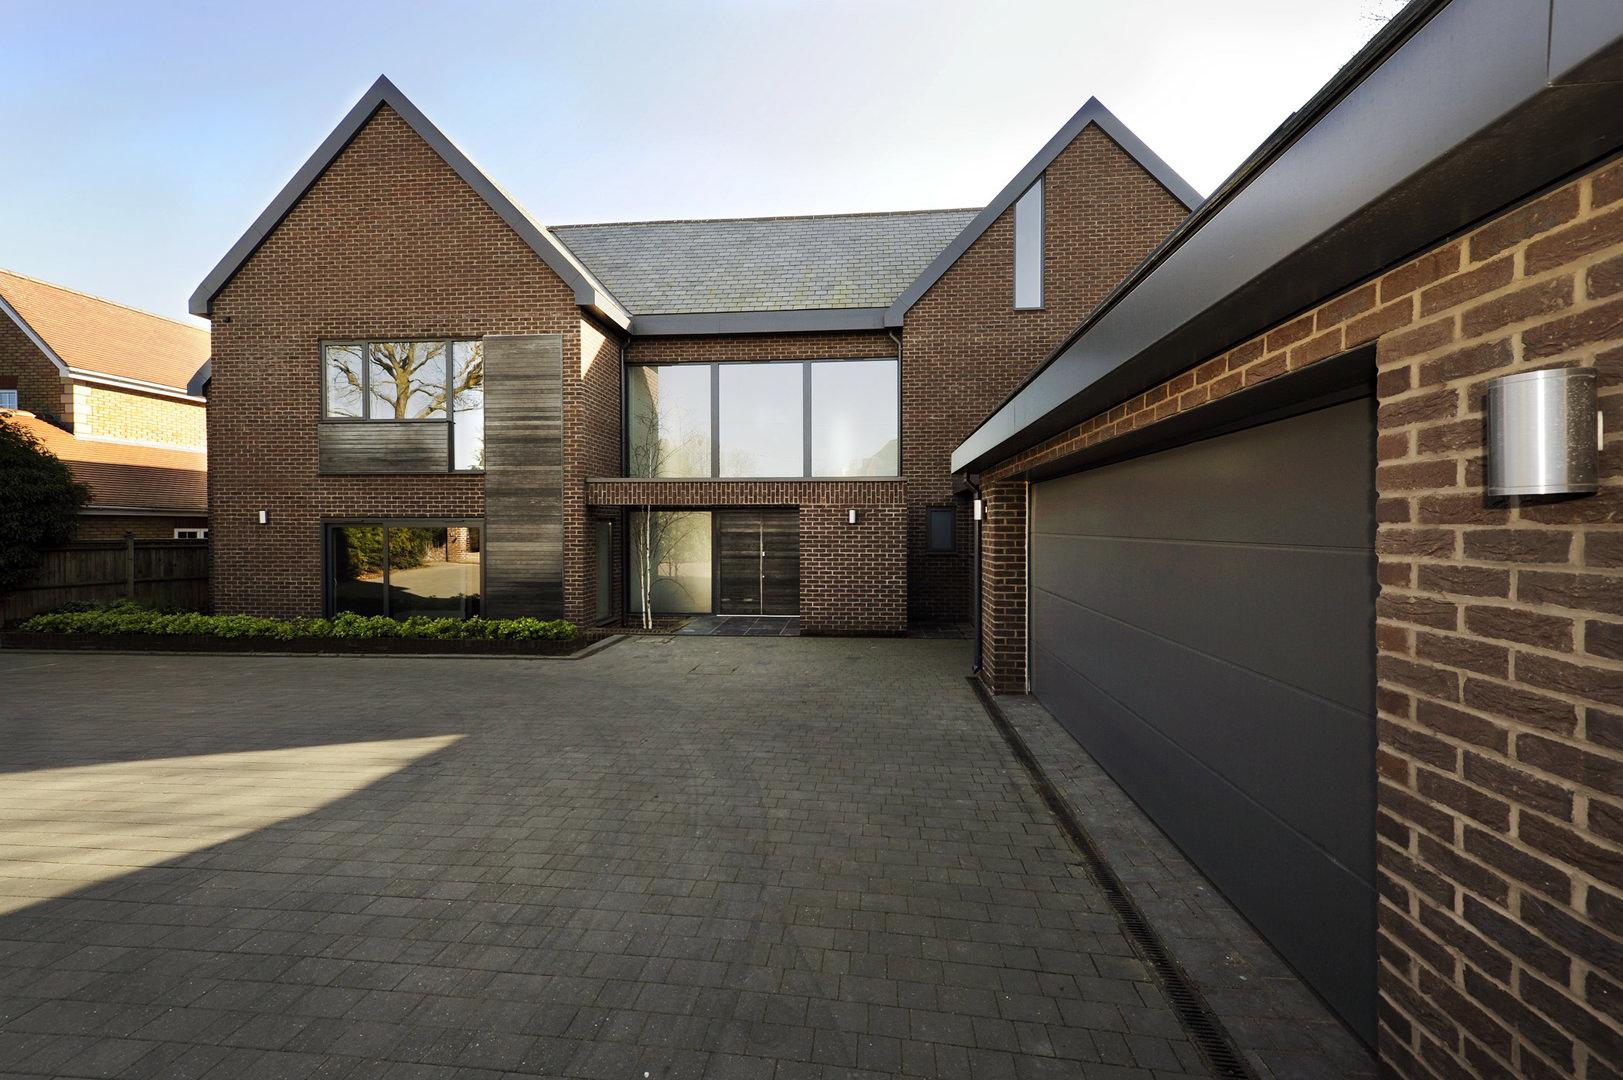 East Ridgeway House - 1270S_PI006